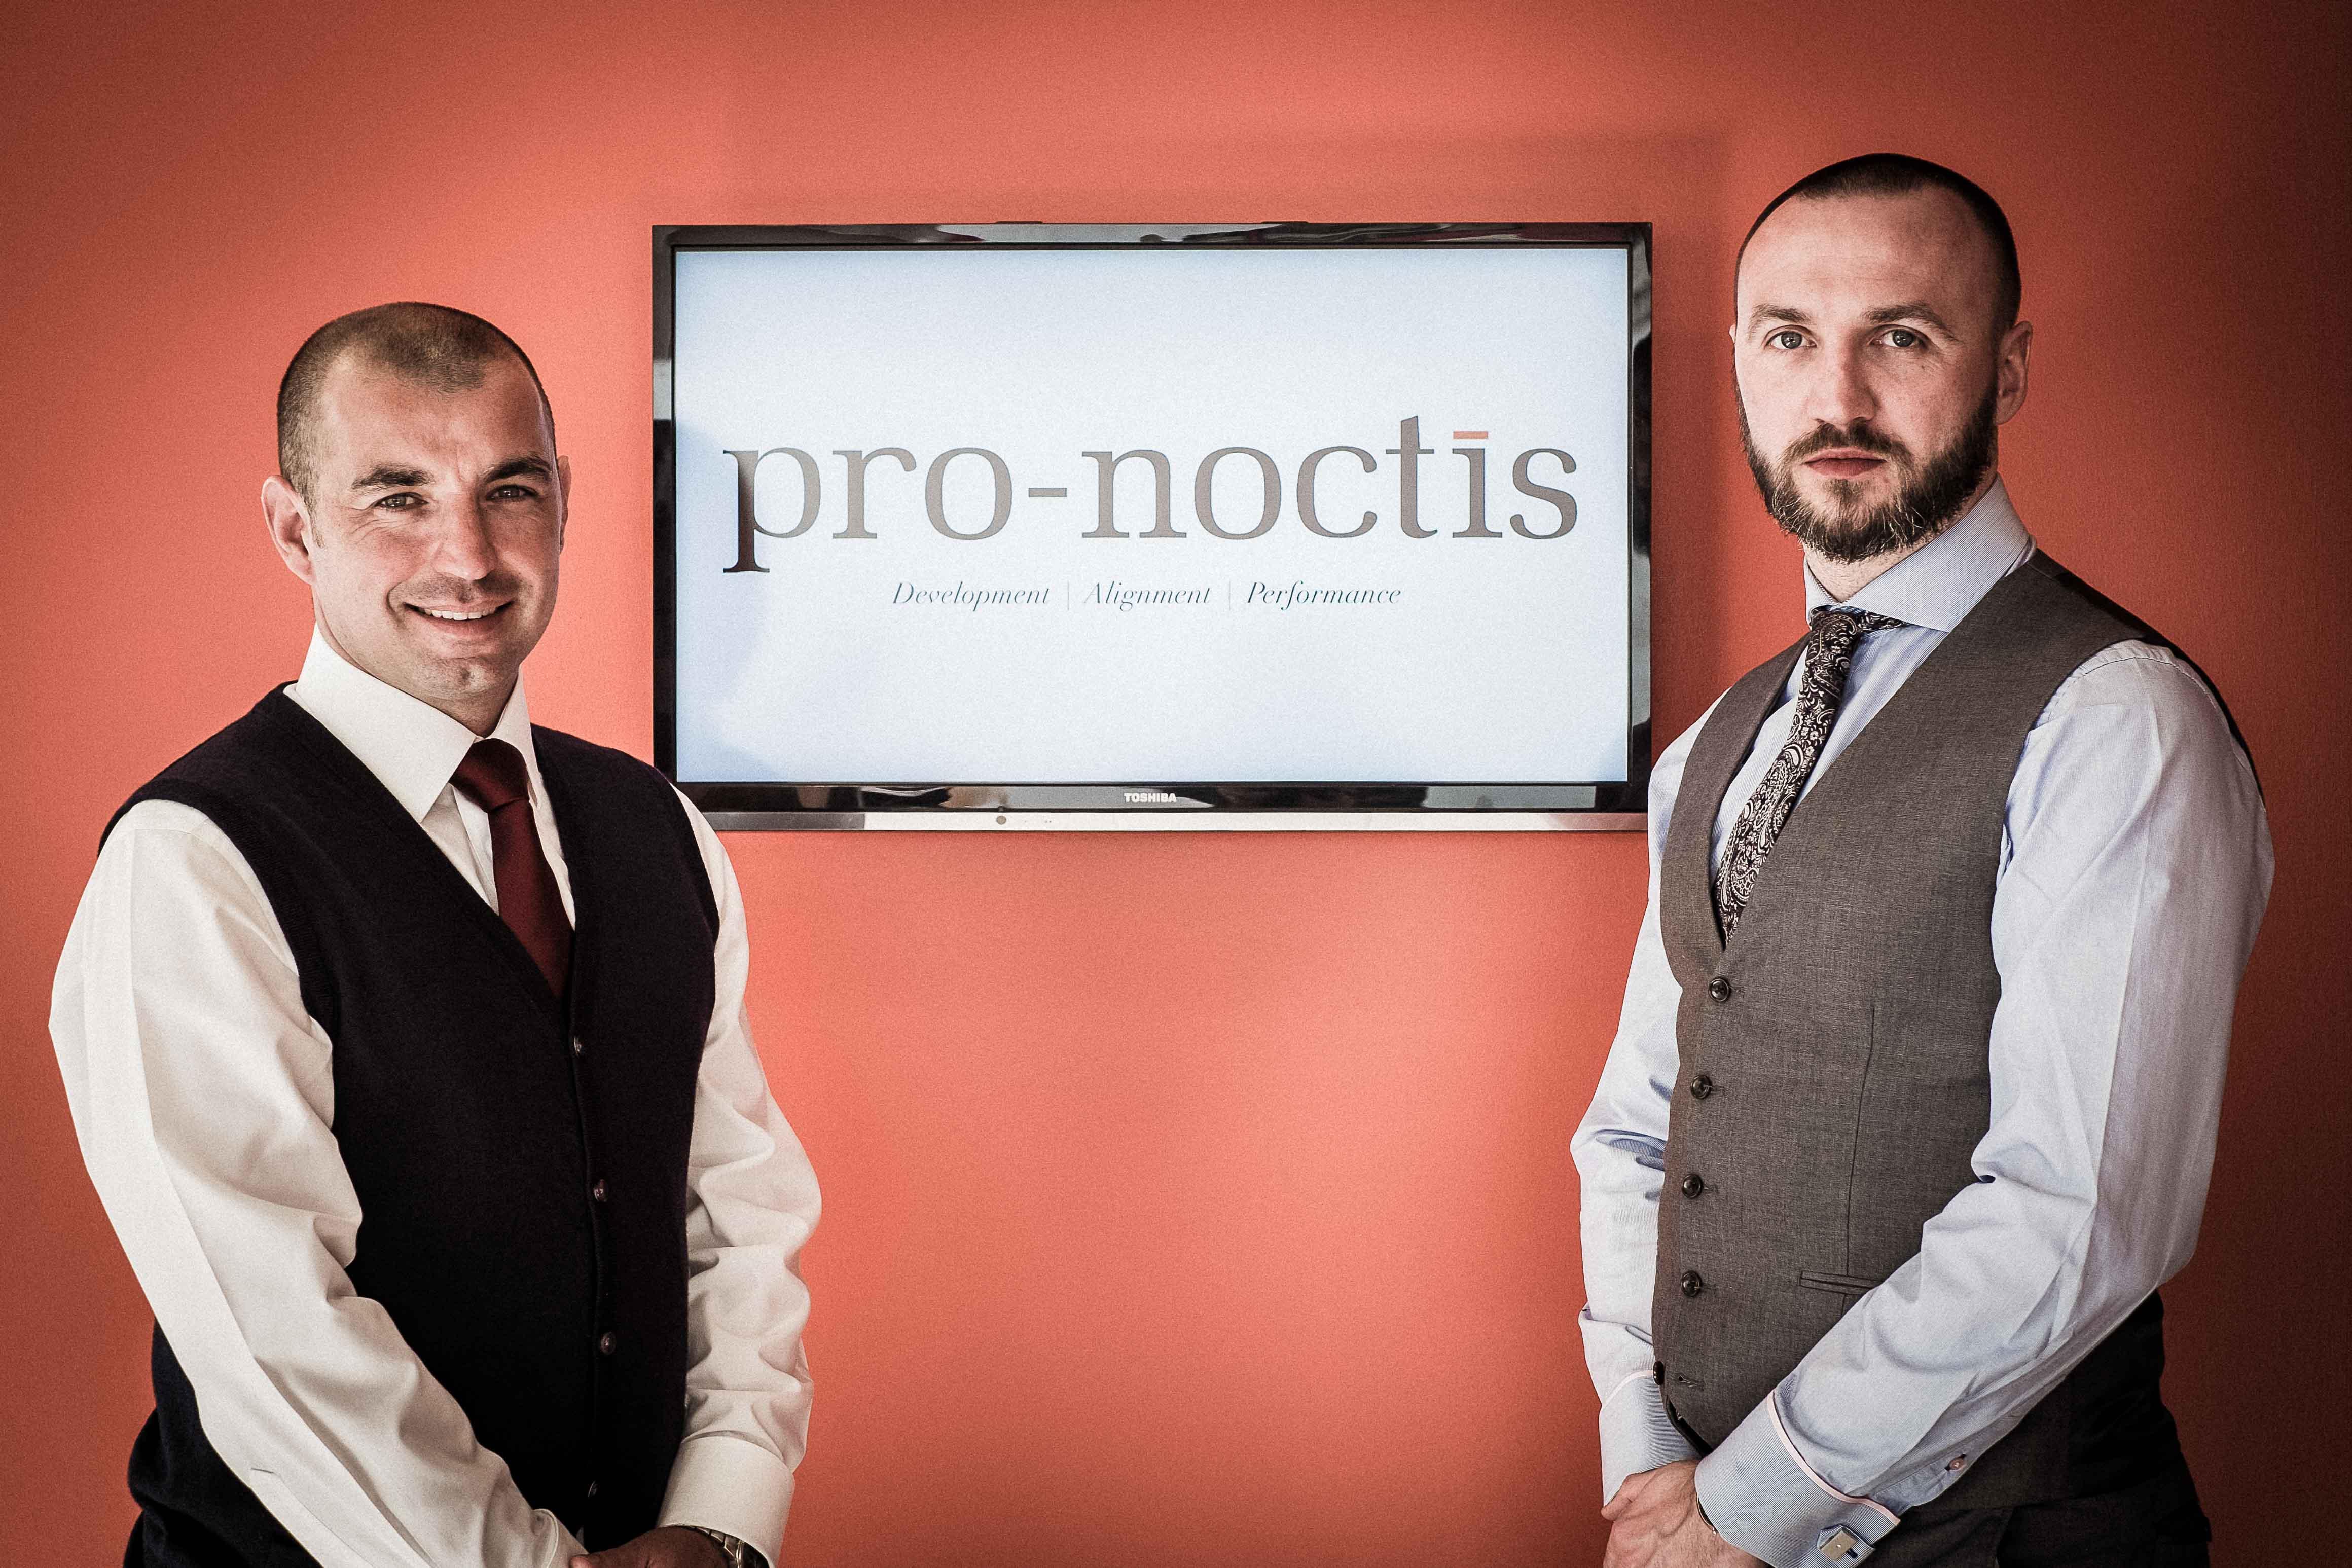 Pro-noctis-directors-phil-quirk-phil-kelly-001